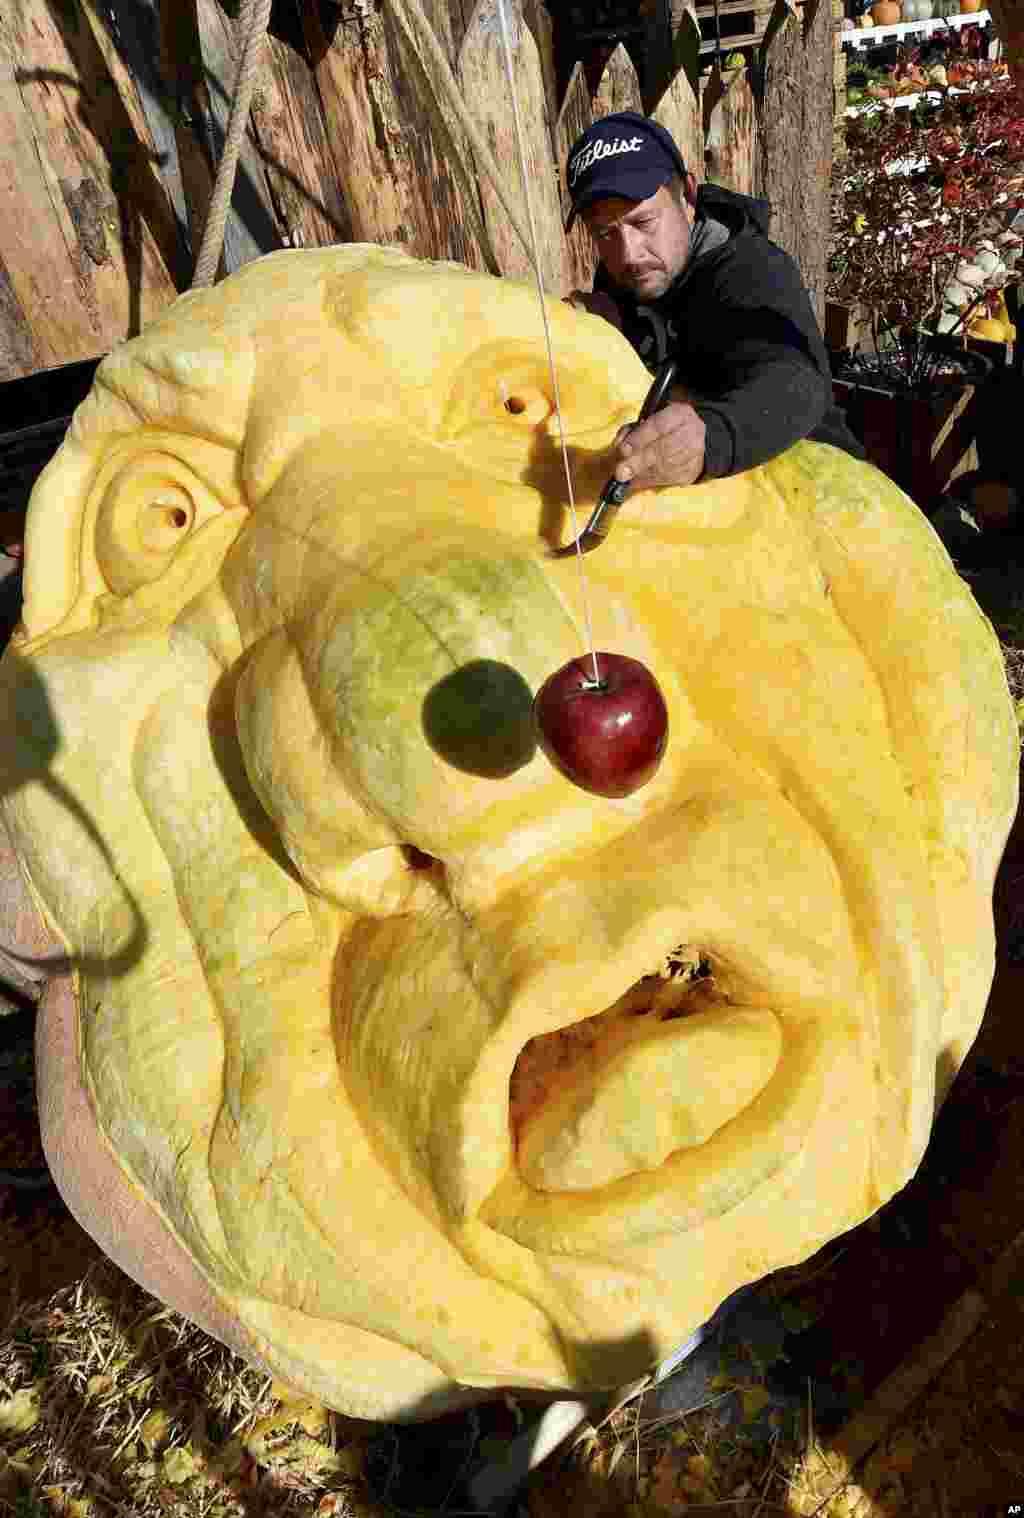 Rick Reiski works on a 560 kg pumpkin on occasion of a pumpkin exhibition in Klaistow, eastern Germany.